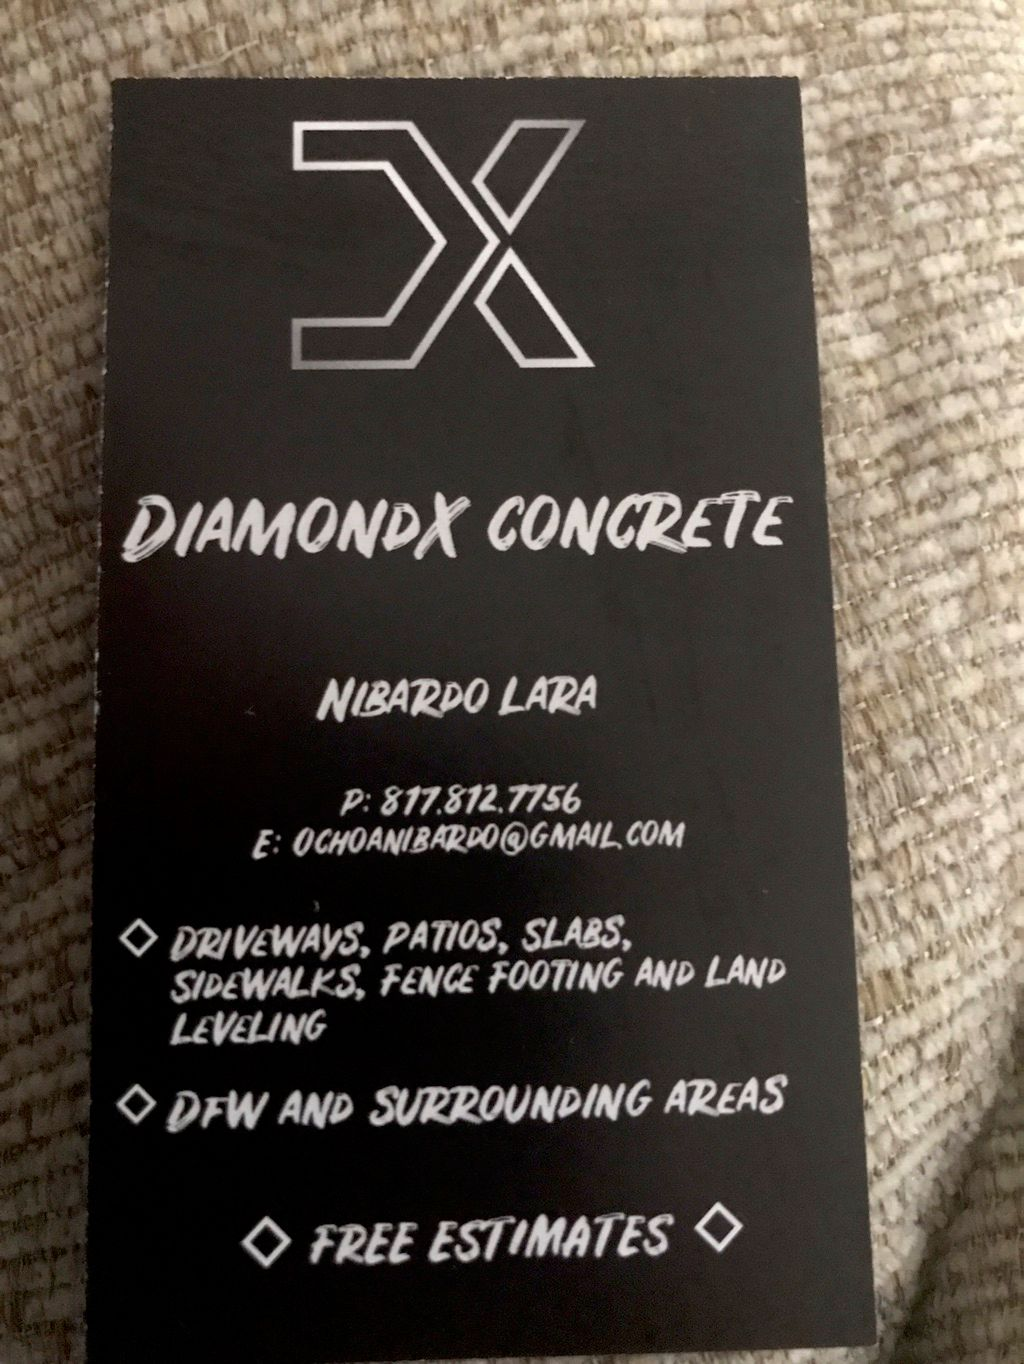 DIAMONDX CONCRETE